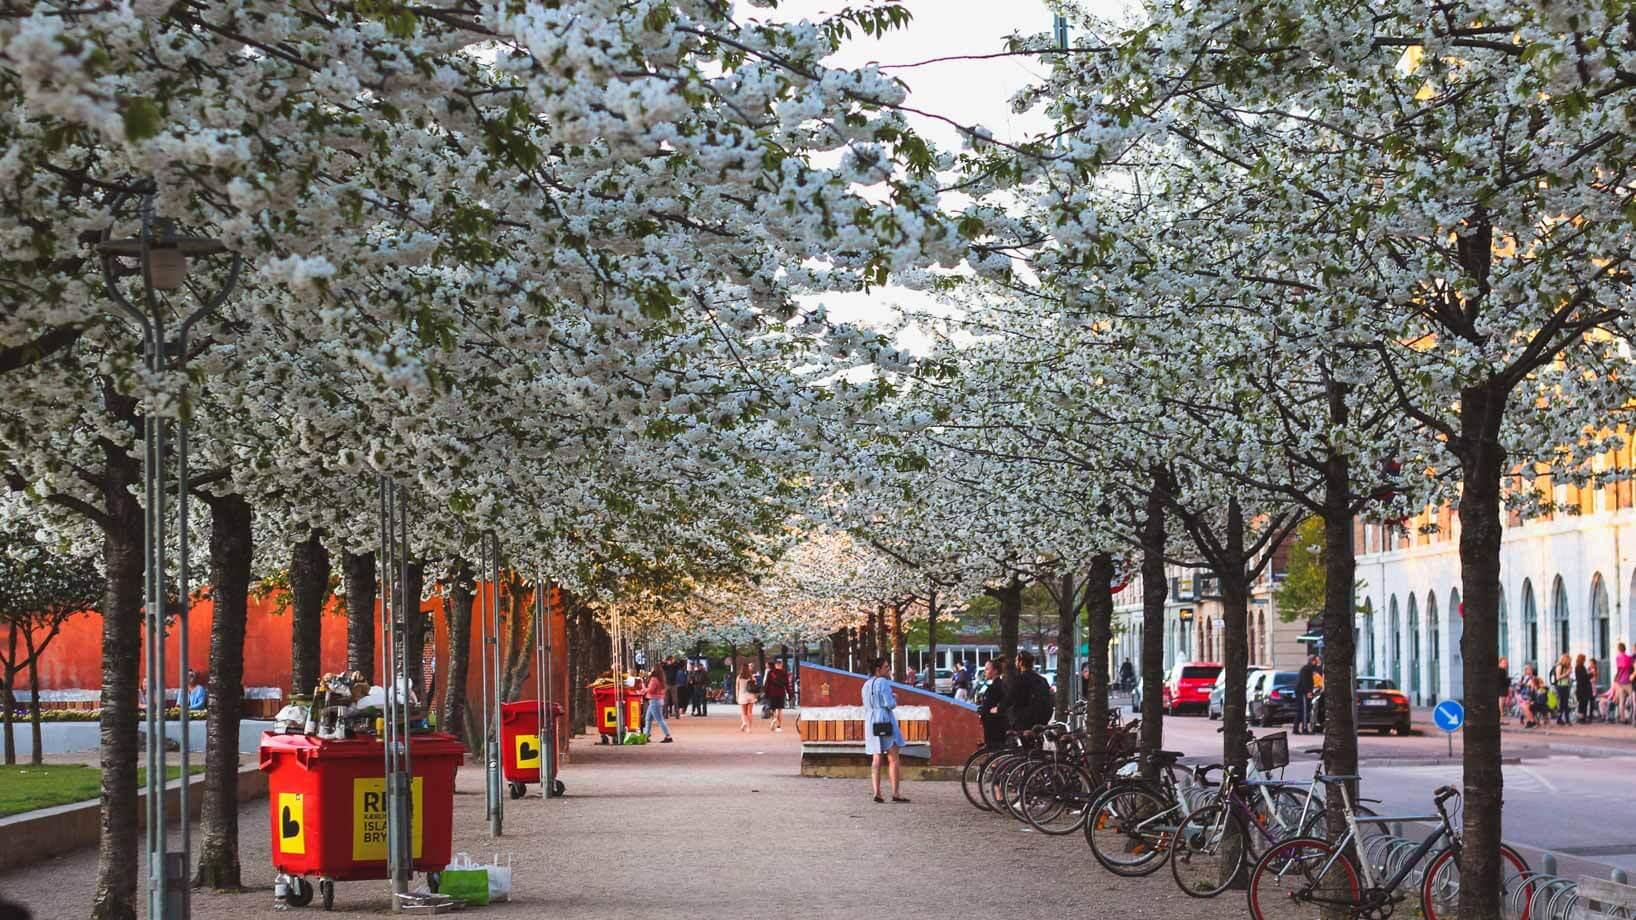 Cherry blossoms in Copenhagen, Islands Brygge